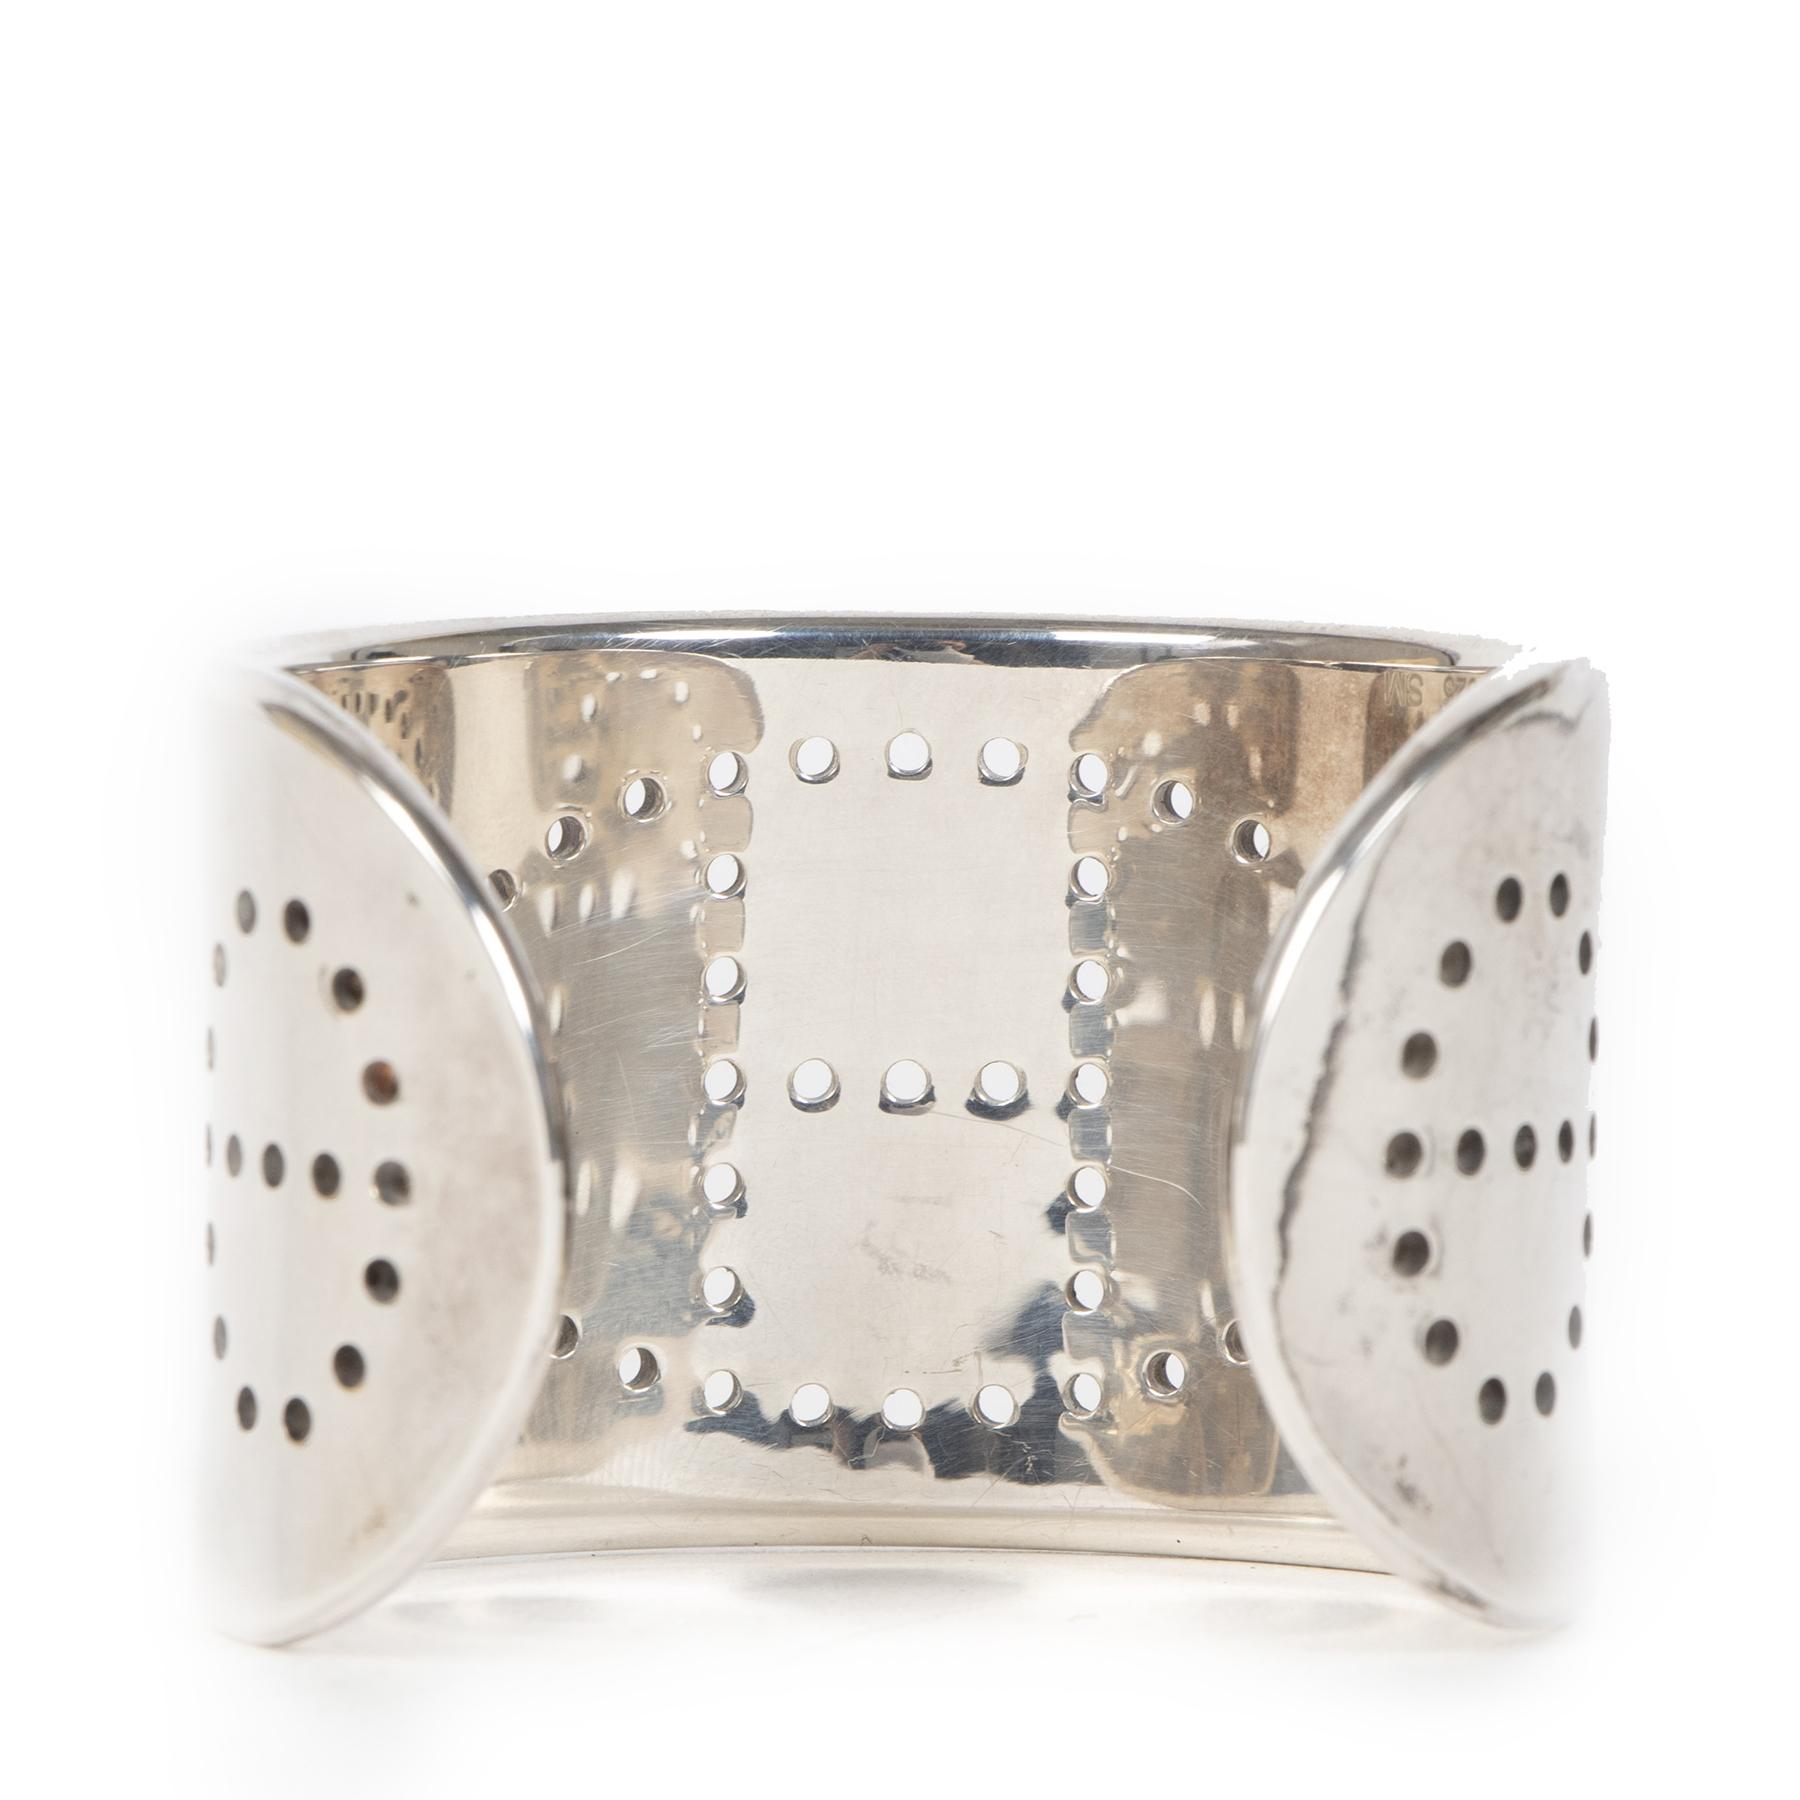 Authentieke Tweedehands Hermès Sterling Silver Eclipse Cuff - Small juiste prijs veilig online shoppen luxe merken webshop winkelen Antwerpen België mode fashion